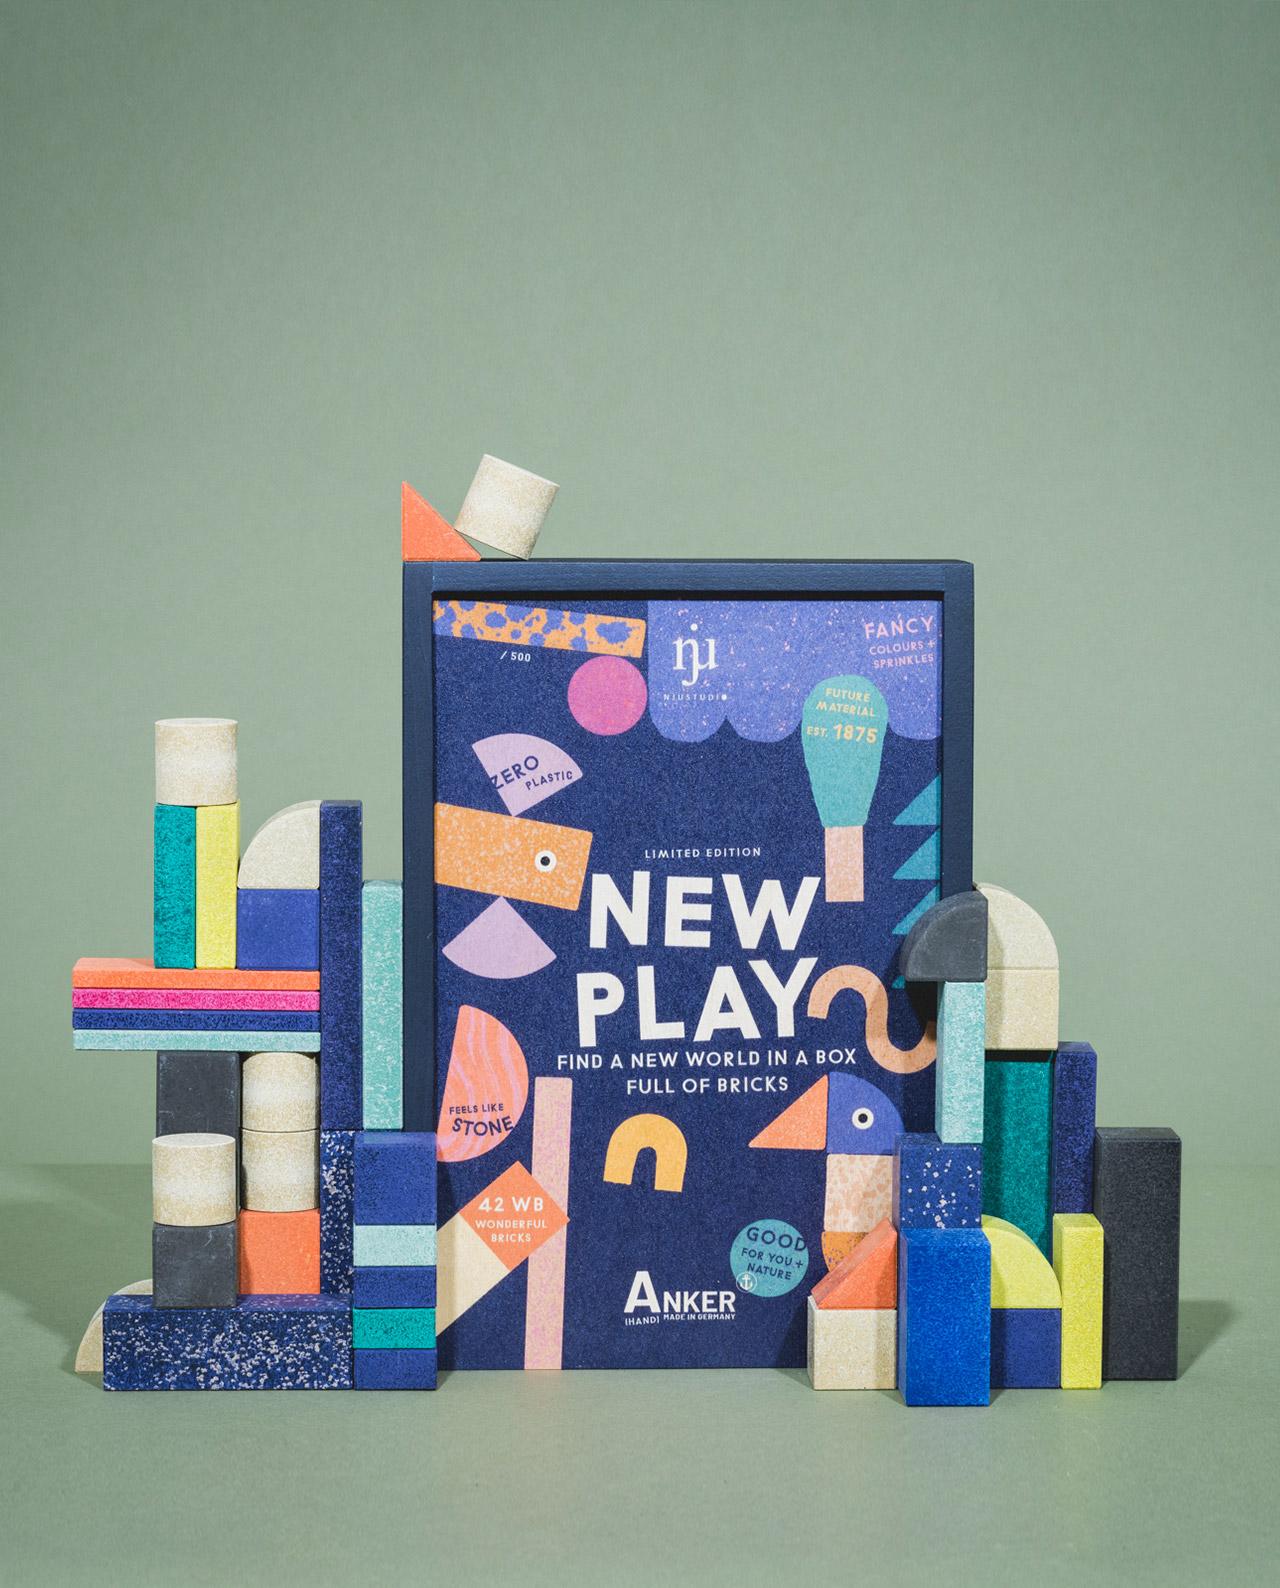 njustudio_new_play_ankersteine_g01